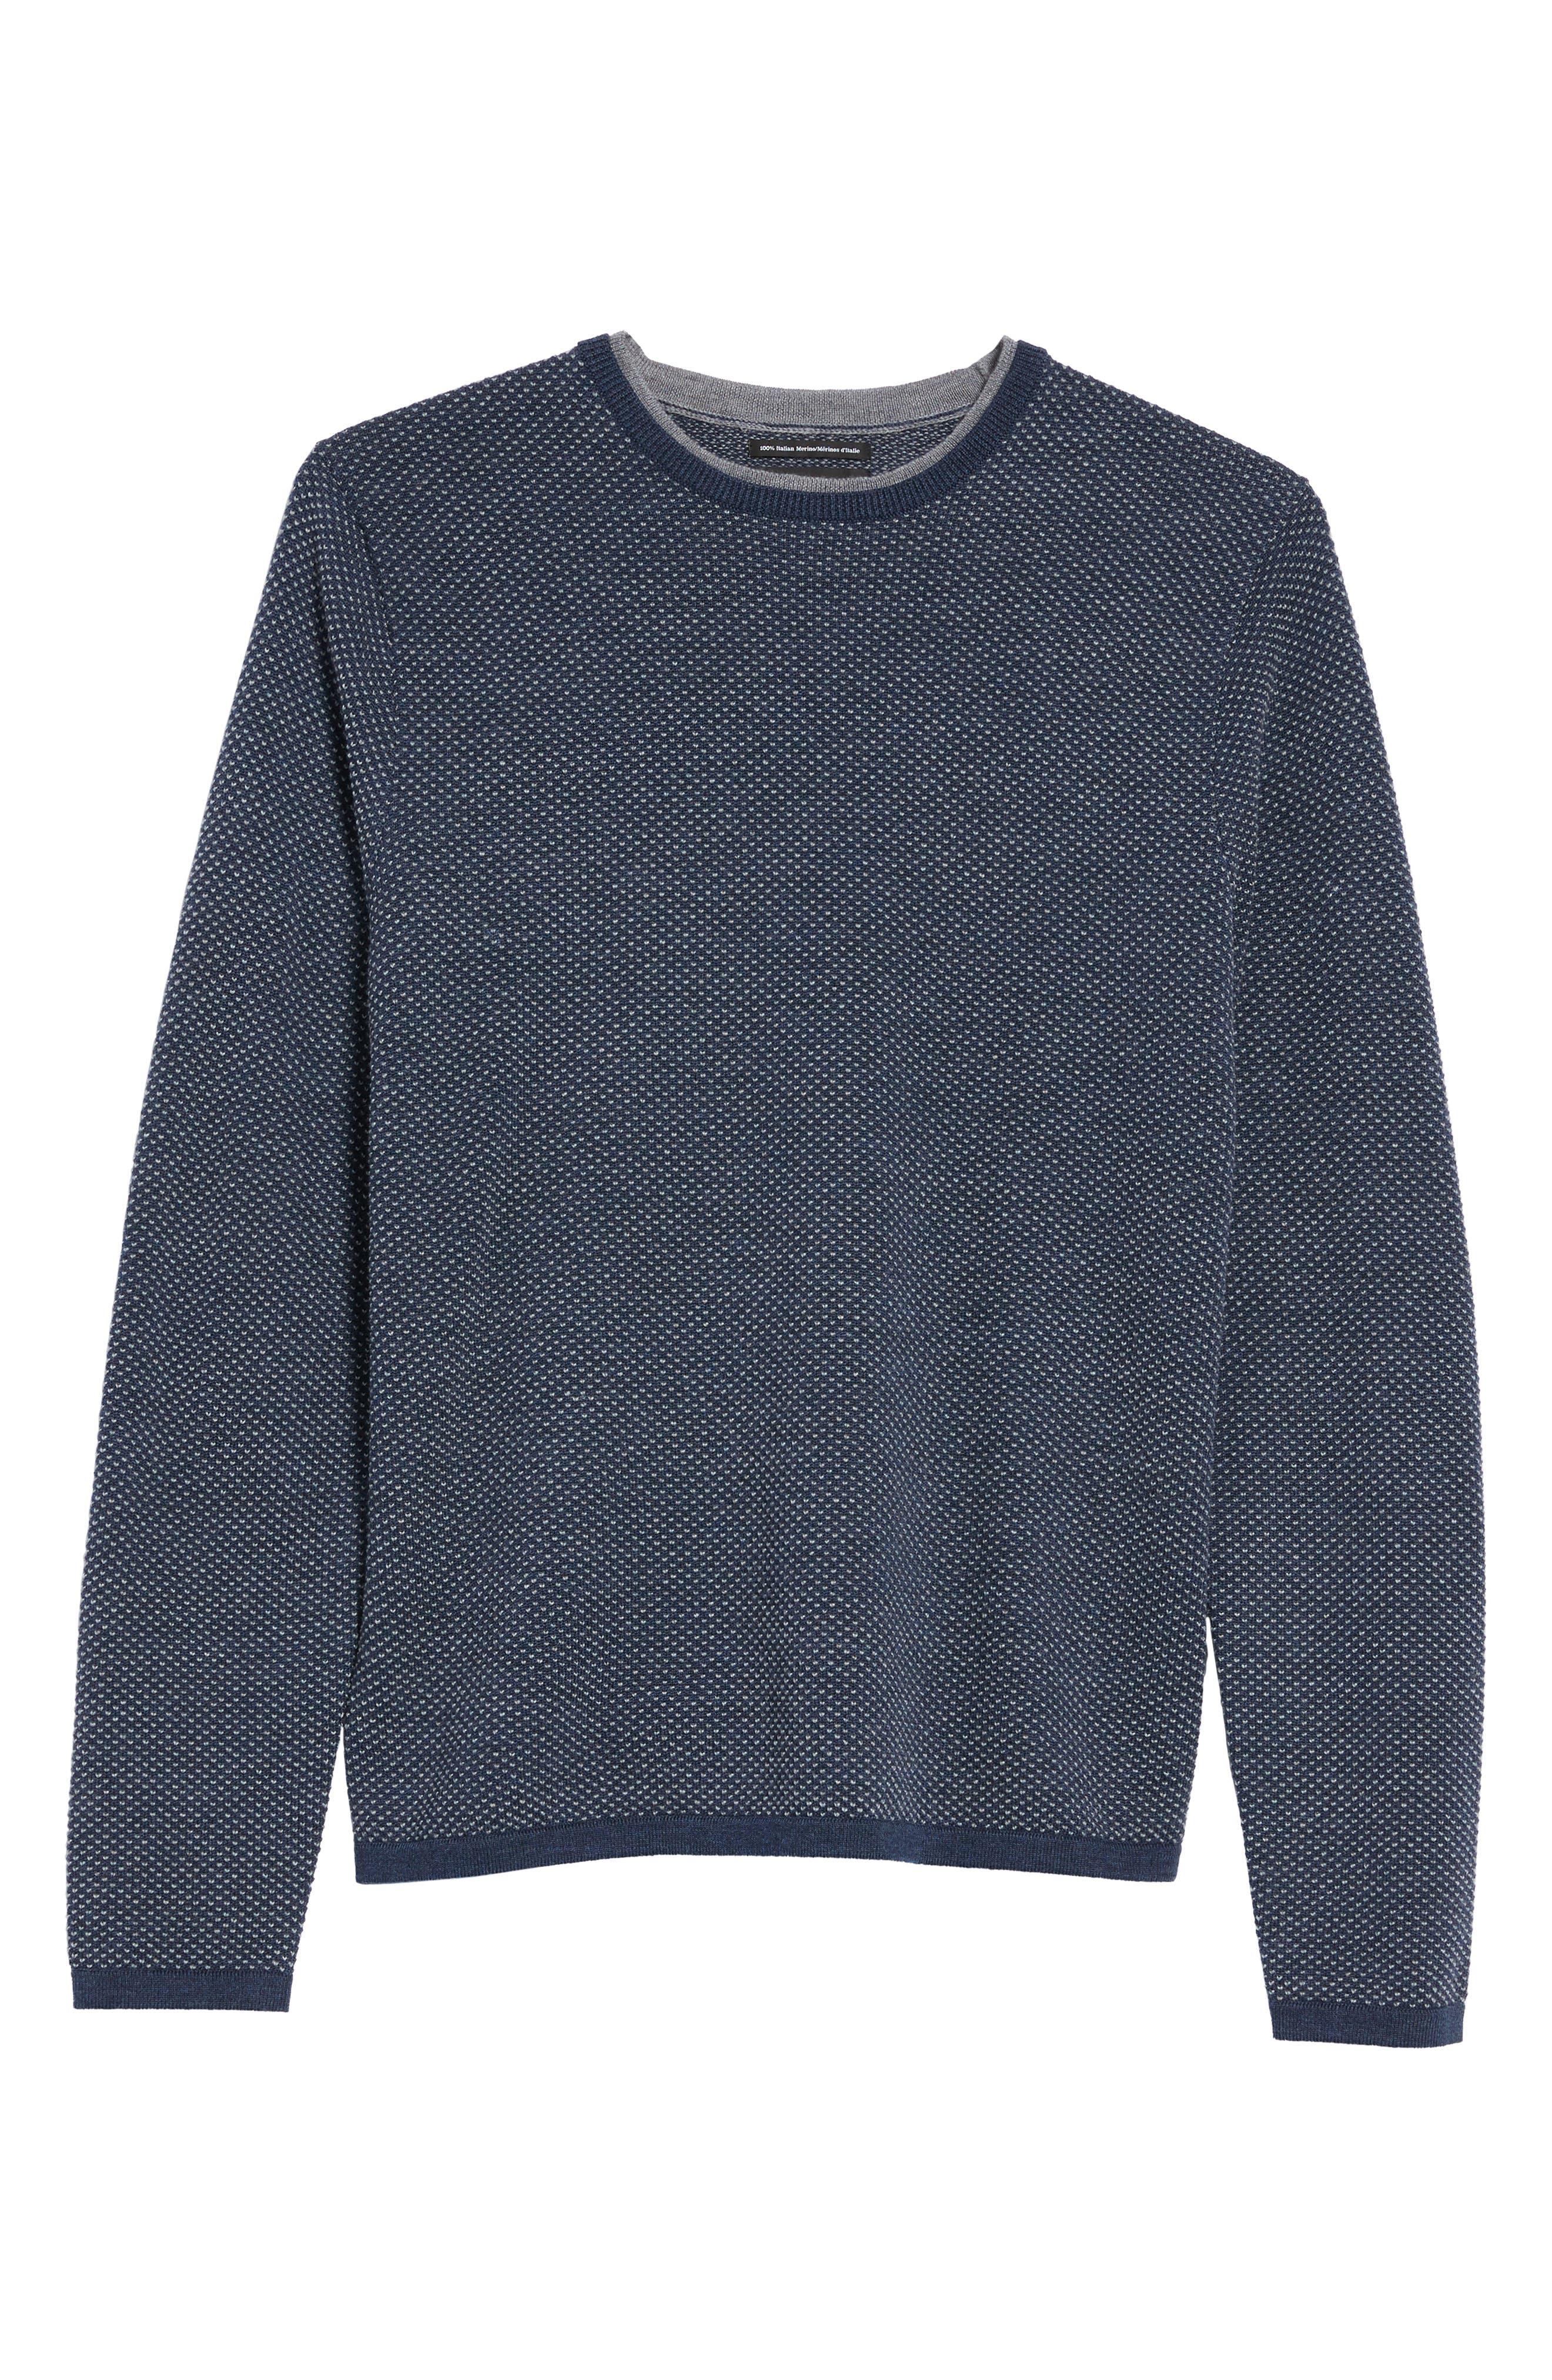 Crewneck Knit Sweater,                             Alternate thumbnail 6, color,